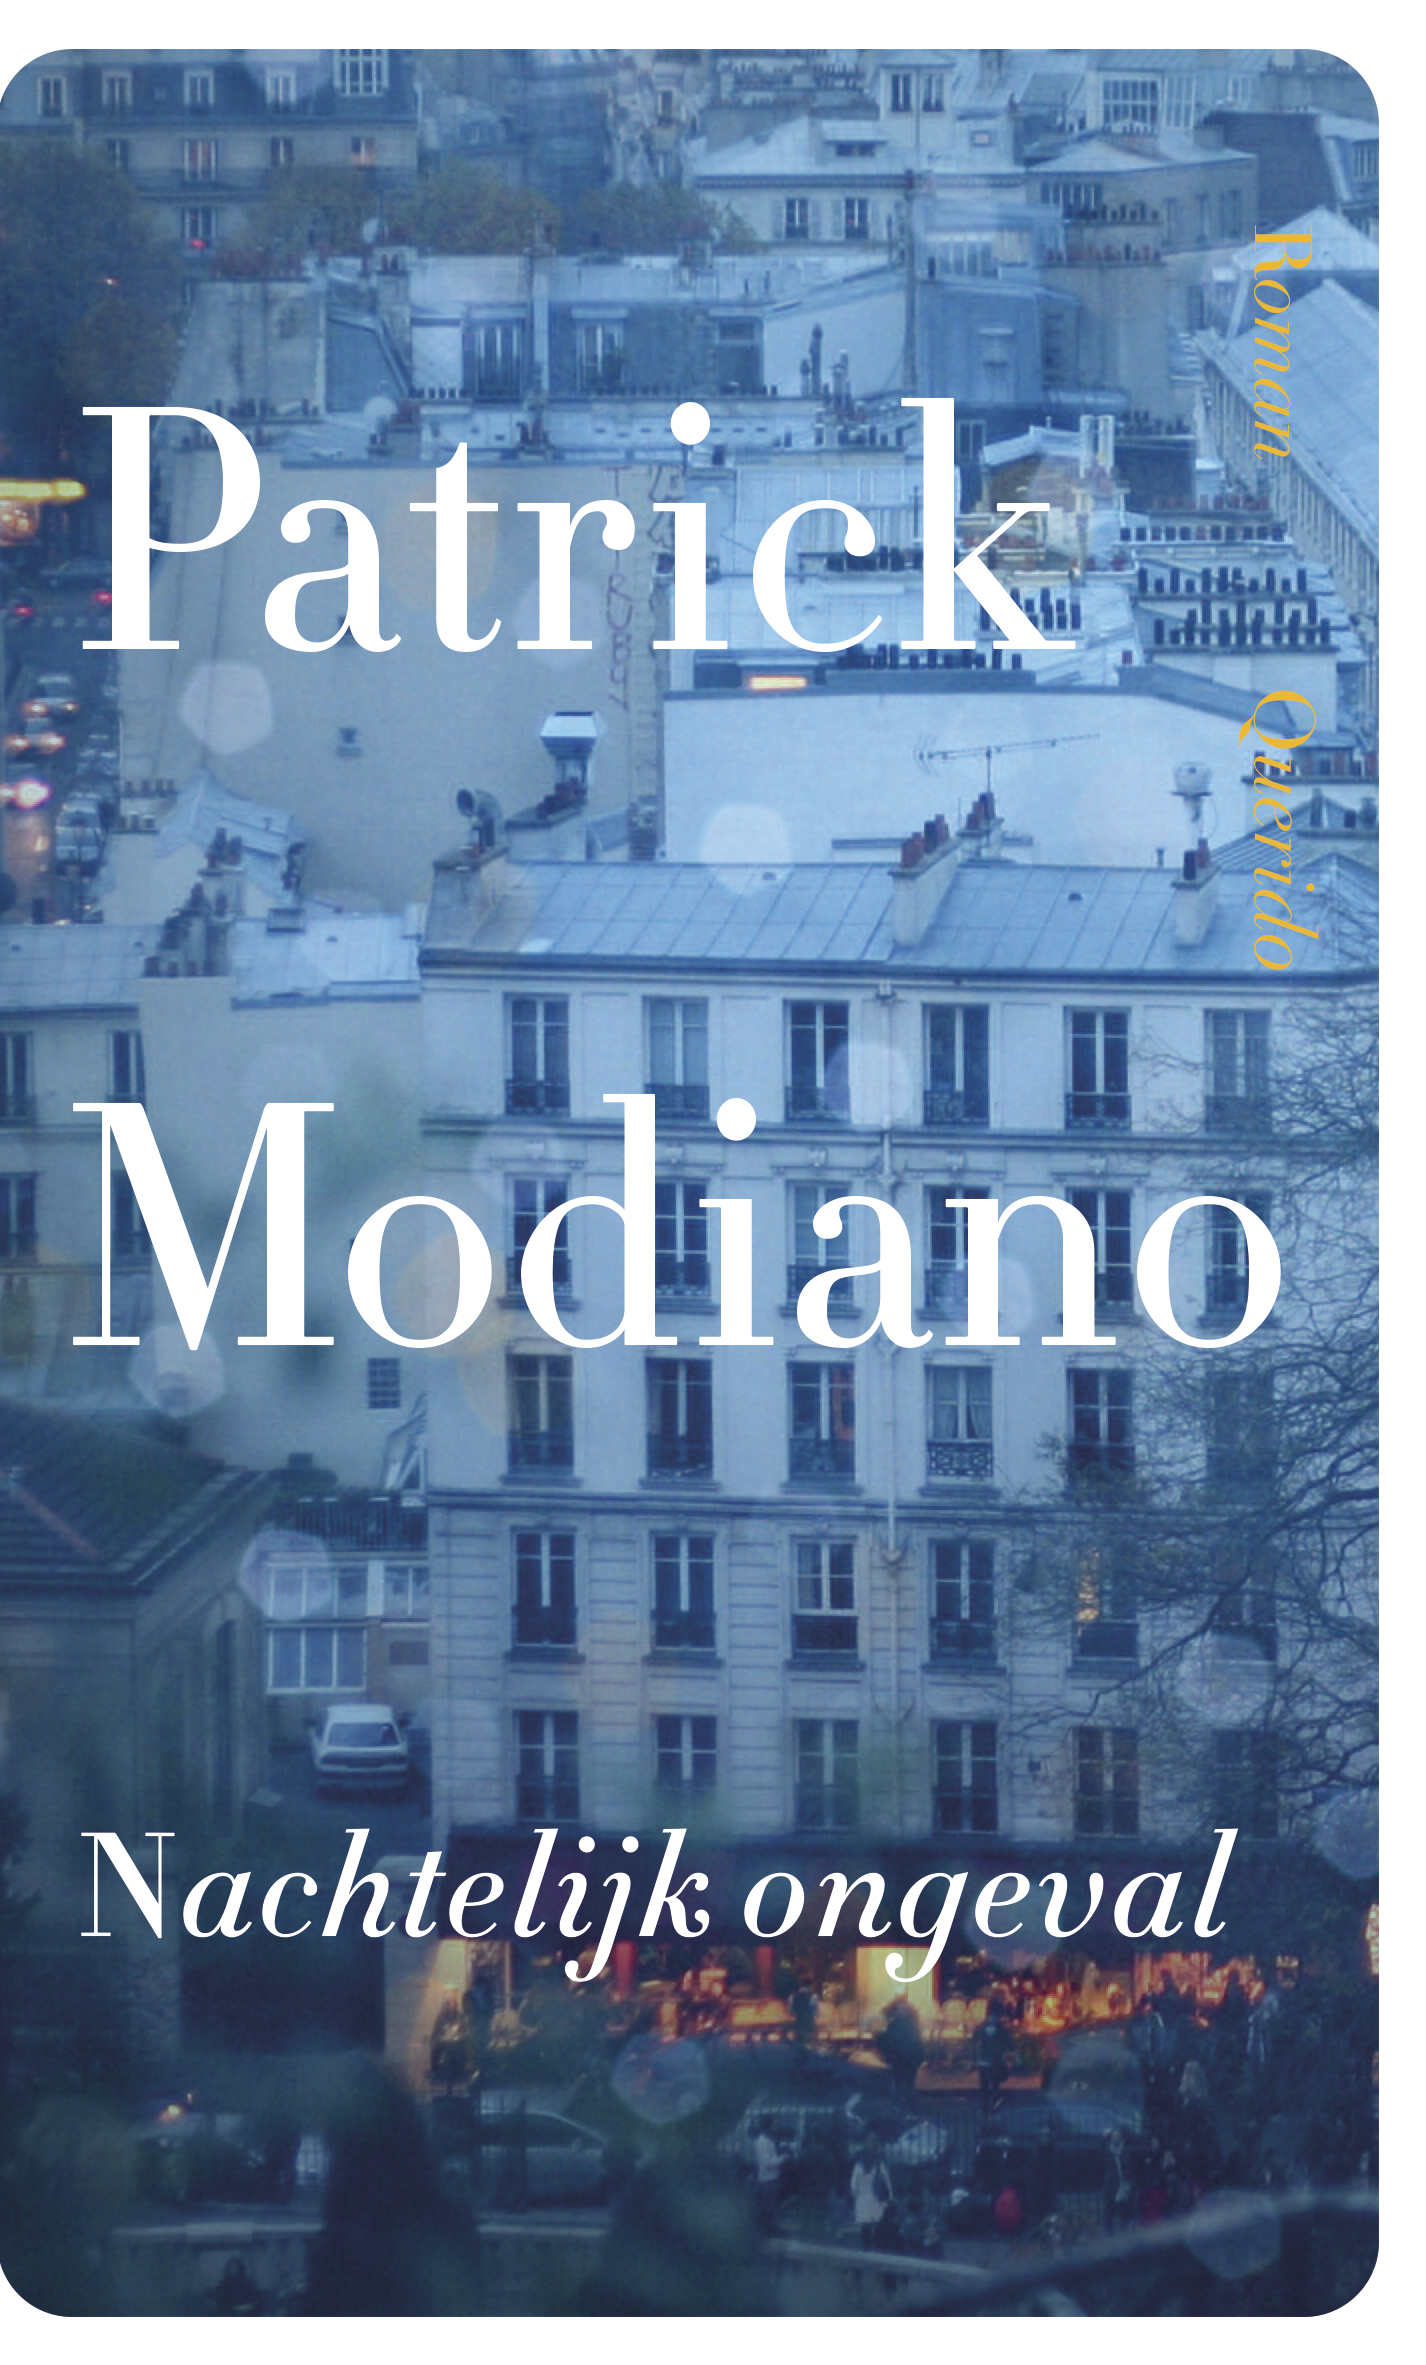 Nachtelijk ongeval – Patrick Modiano